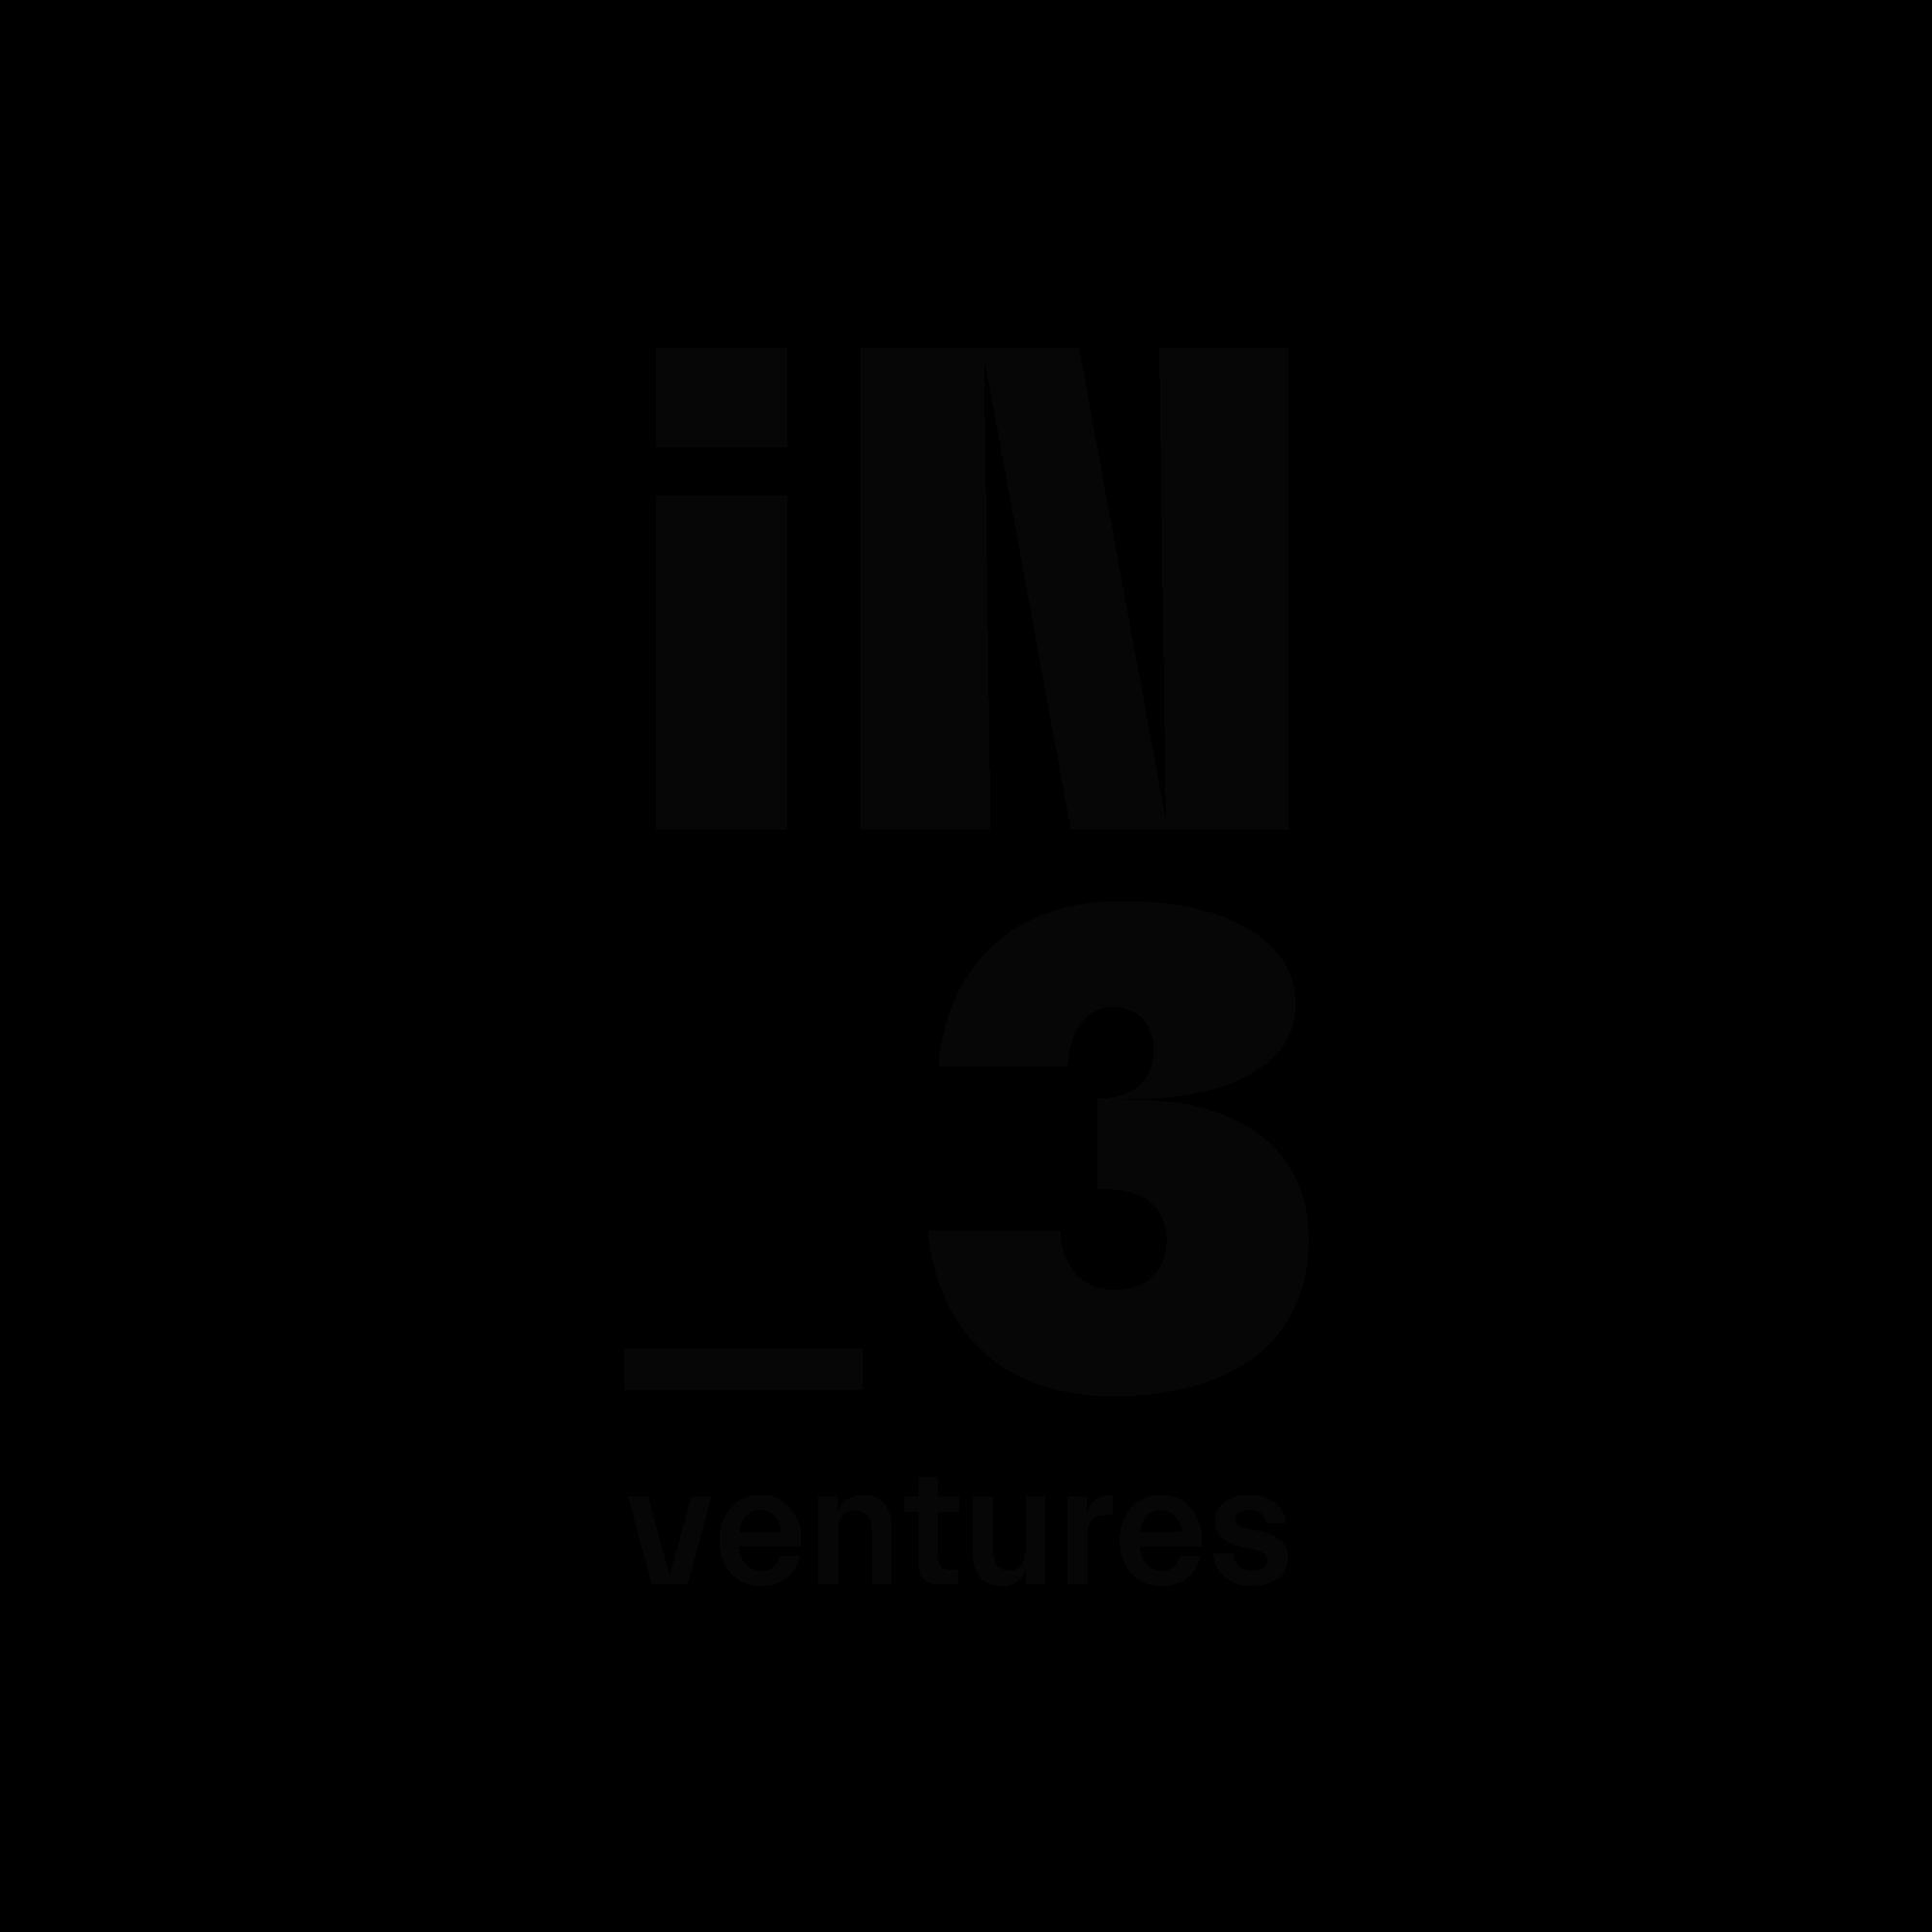 iN3 Ventures - Innovation advisory + Corporate venture capital